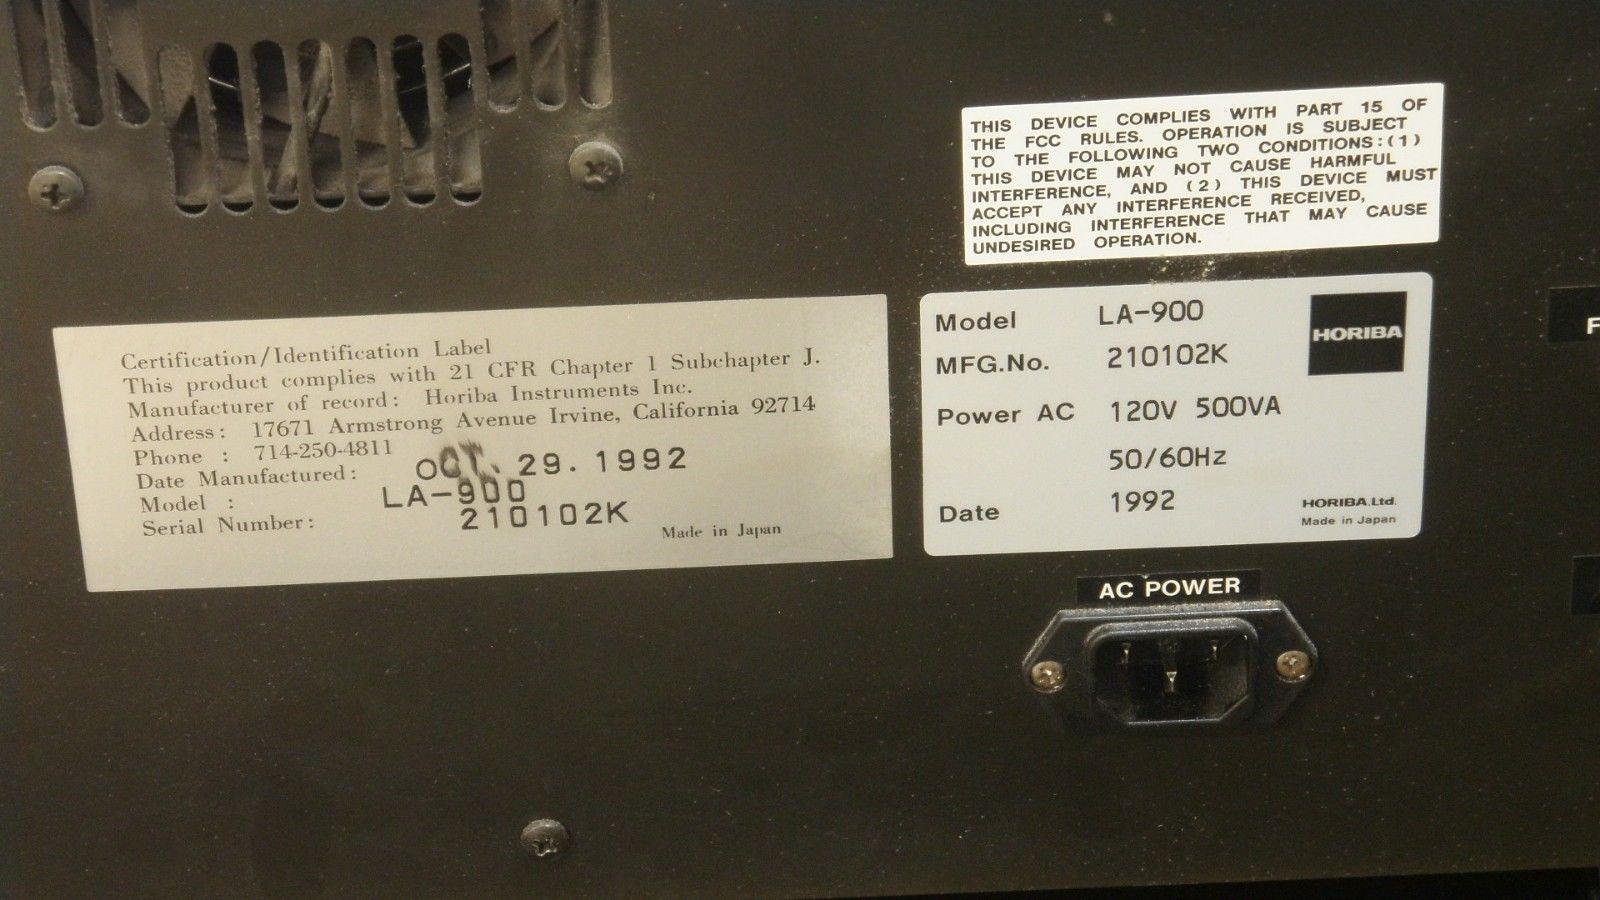 HORIBA LA-900 Laser Scattering Particle Size Distribution Analyzer